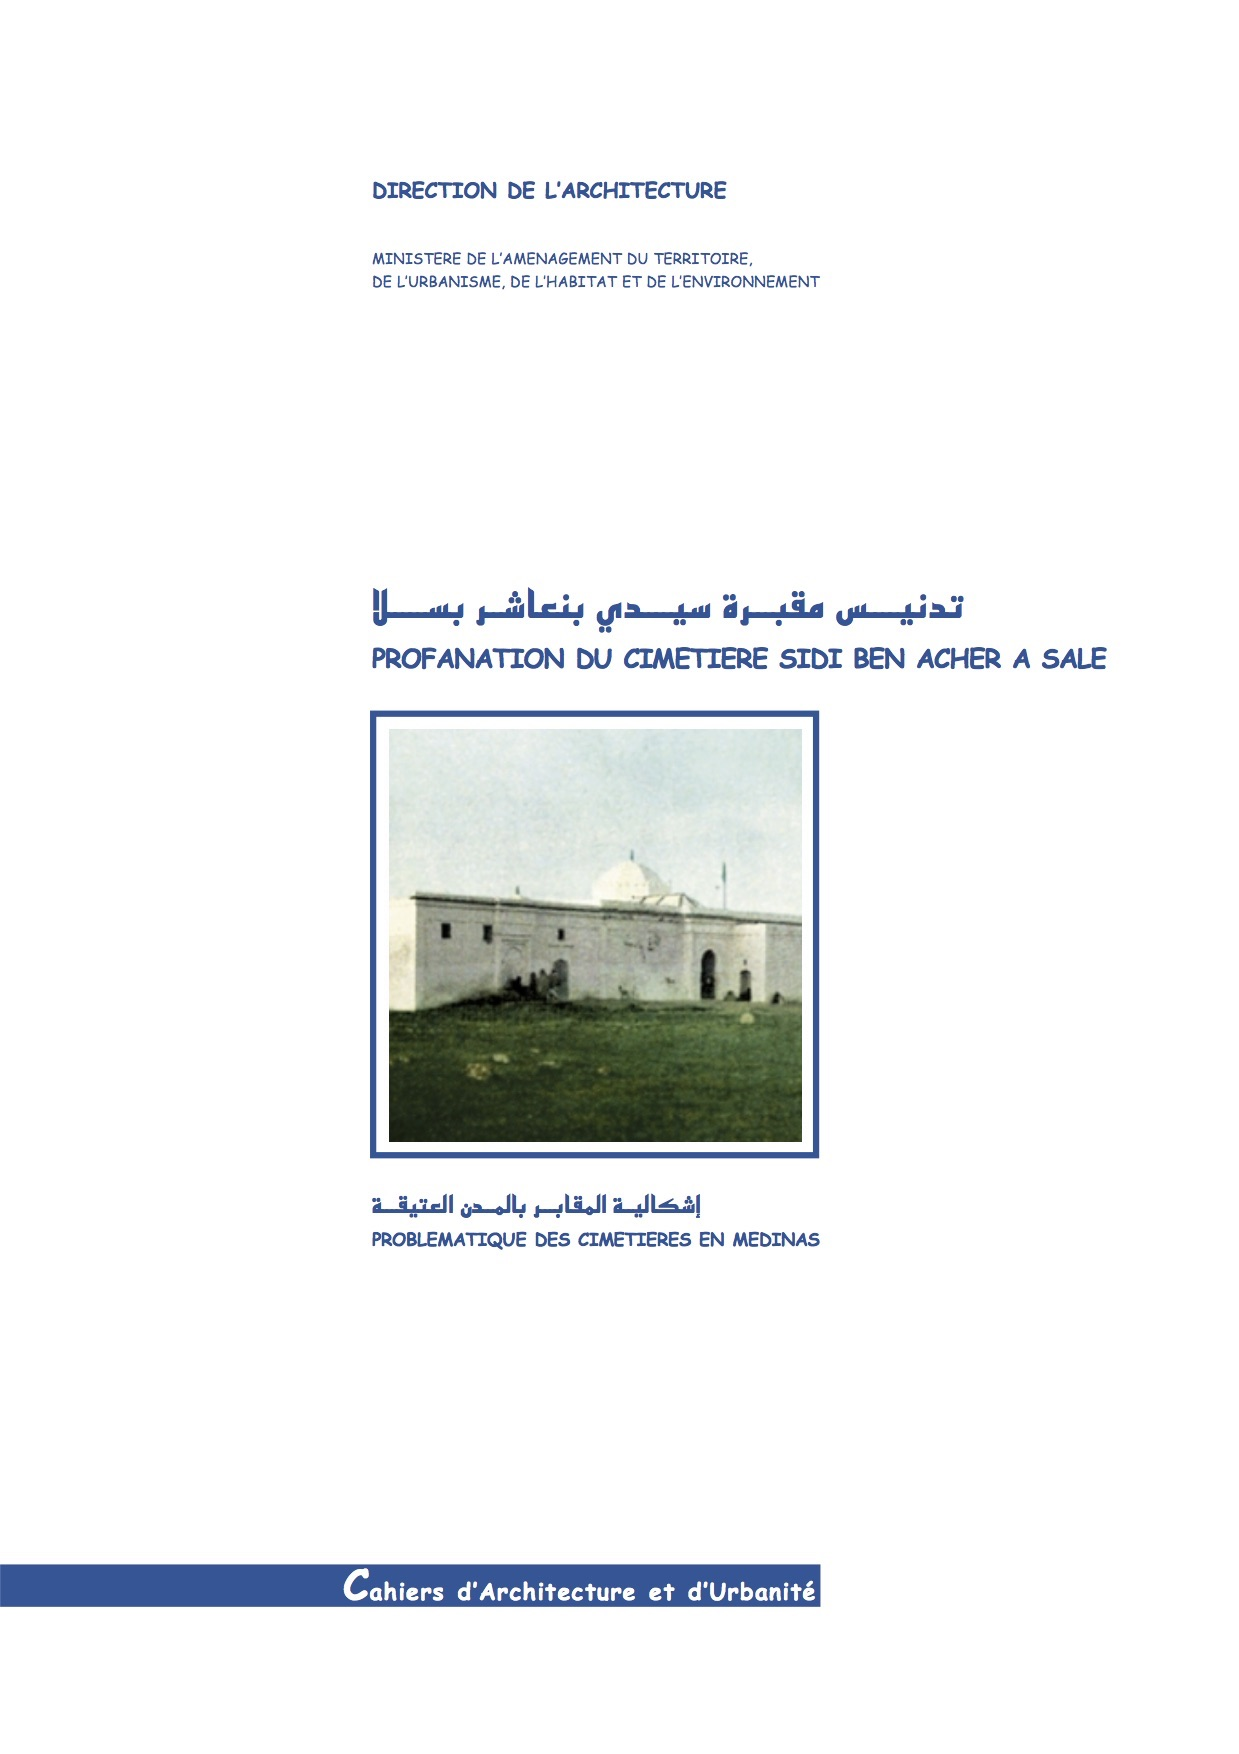 Sidi Ben Acher